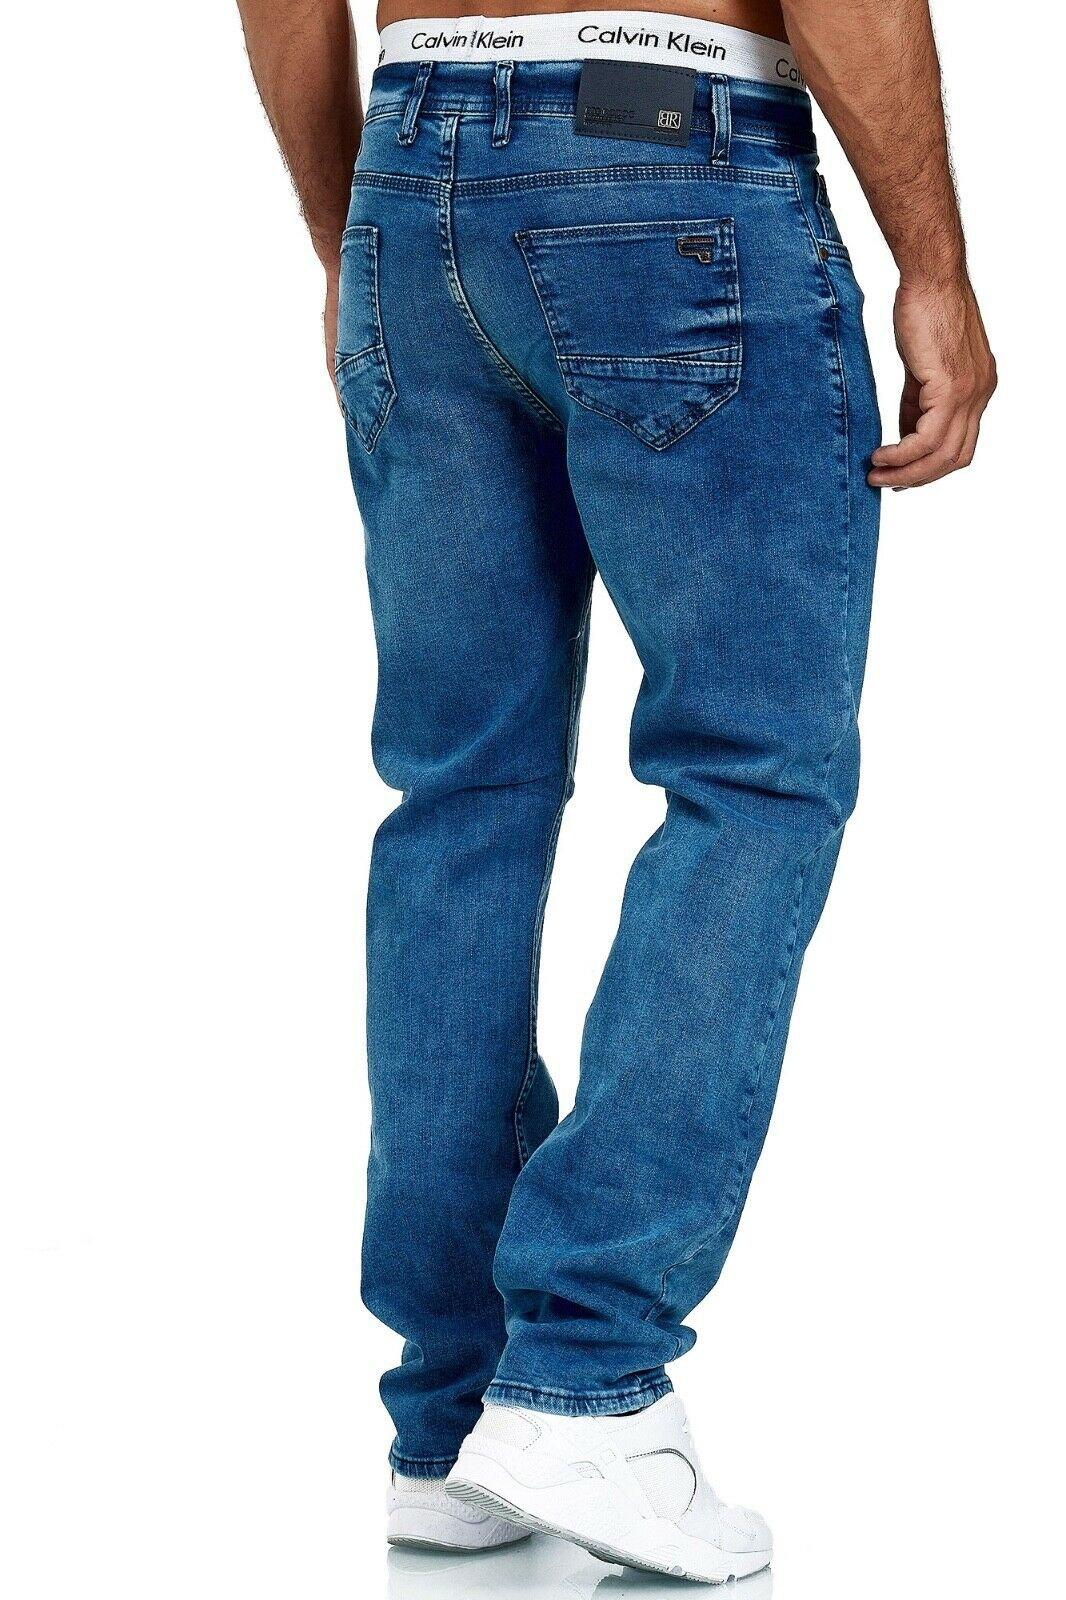 Herren-Jeans-Hose-Denim-KC-Black-Washed-Straight-Cut-Regular-Dicke-Naht-naehte Indexbild 64